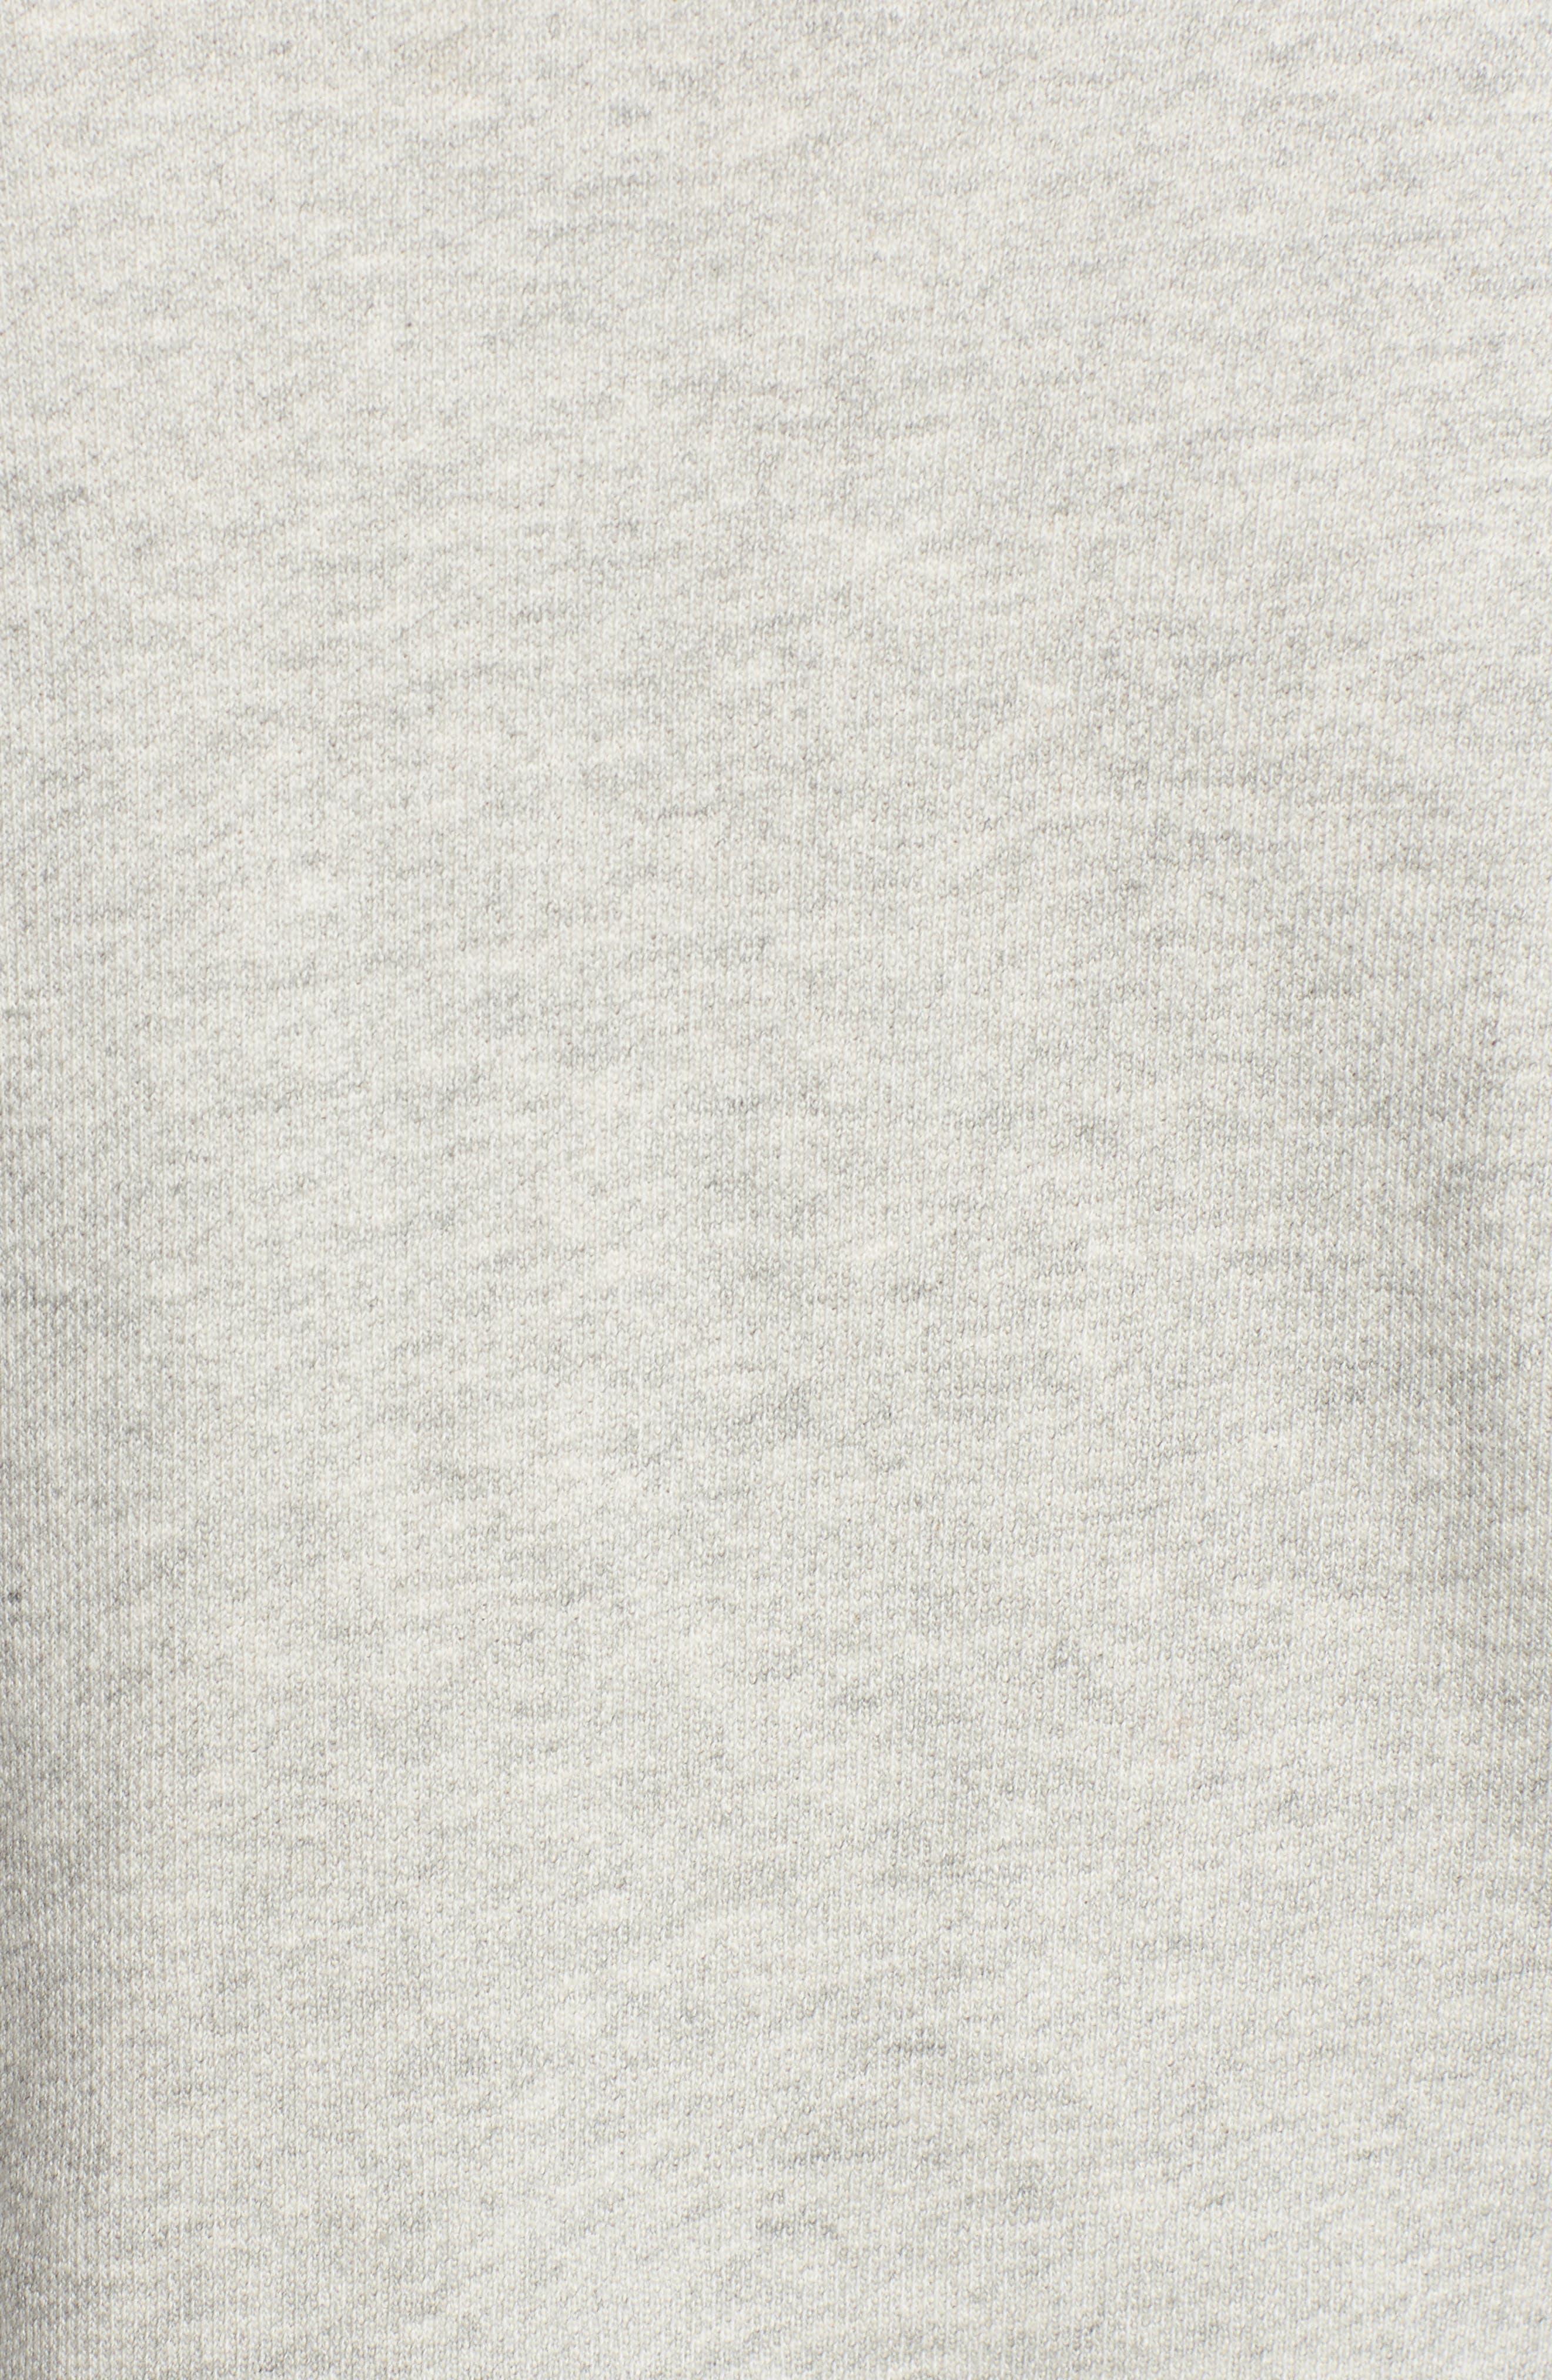 Flare Sleeve Crop Sweatshirt,                             Alternate thumbnail 5, color,                             Heather Grey